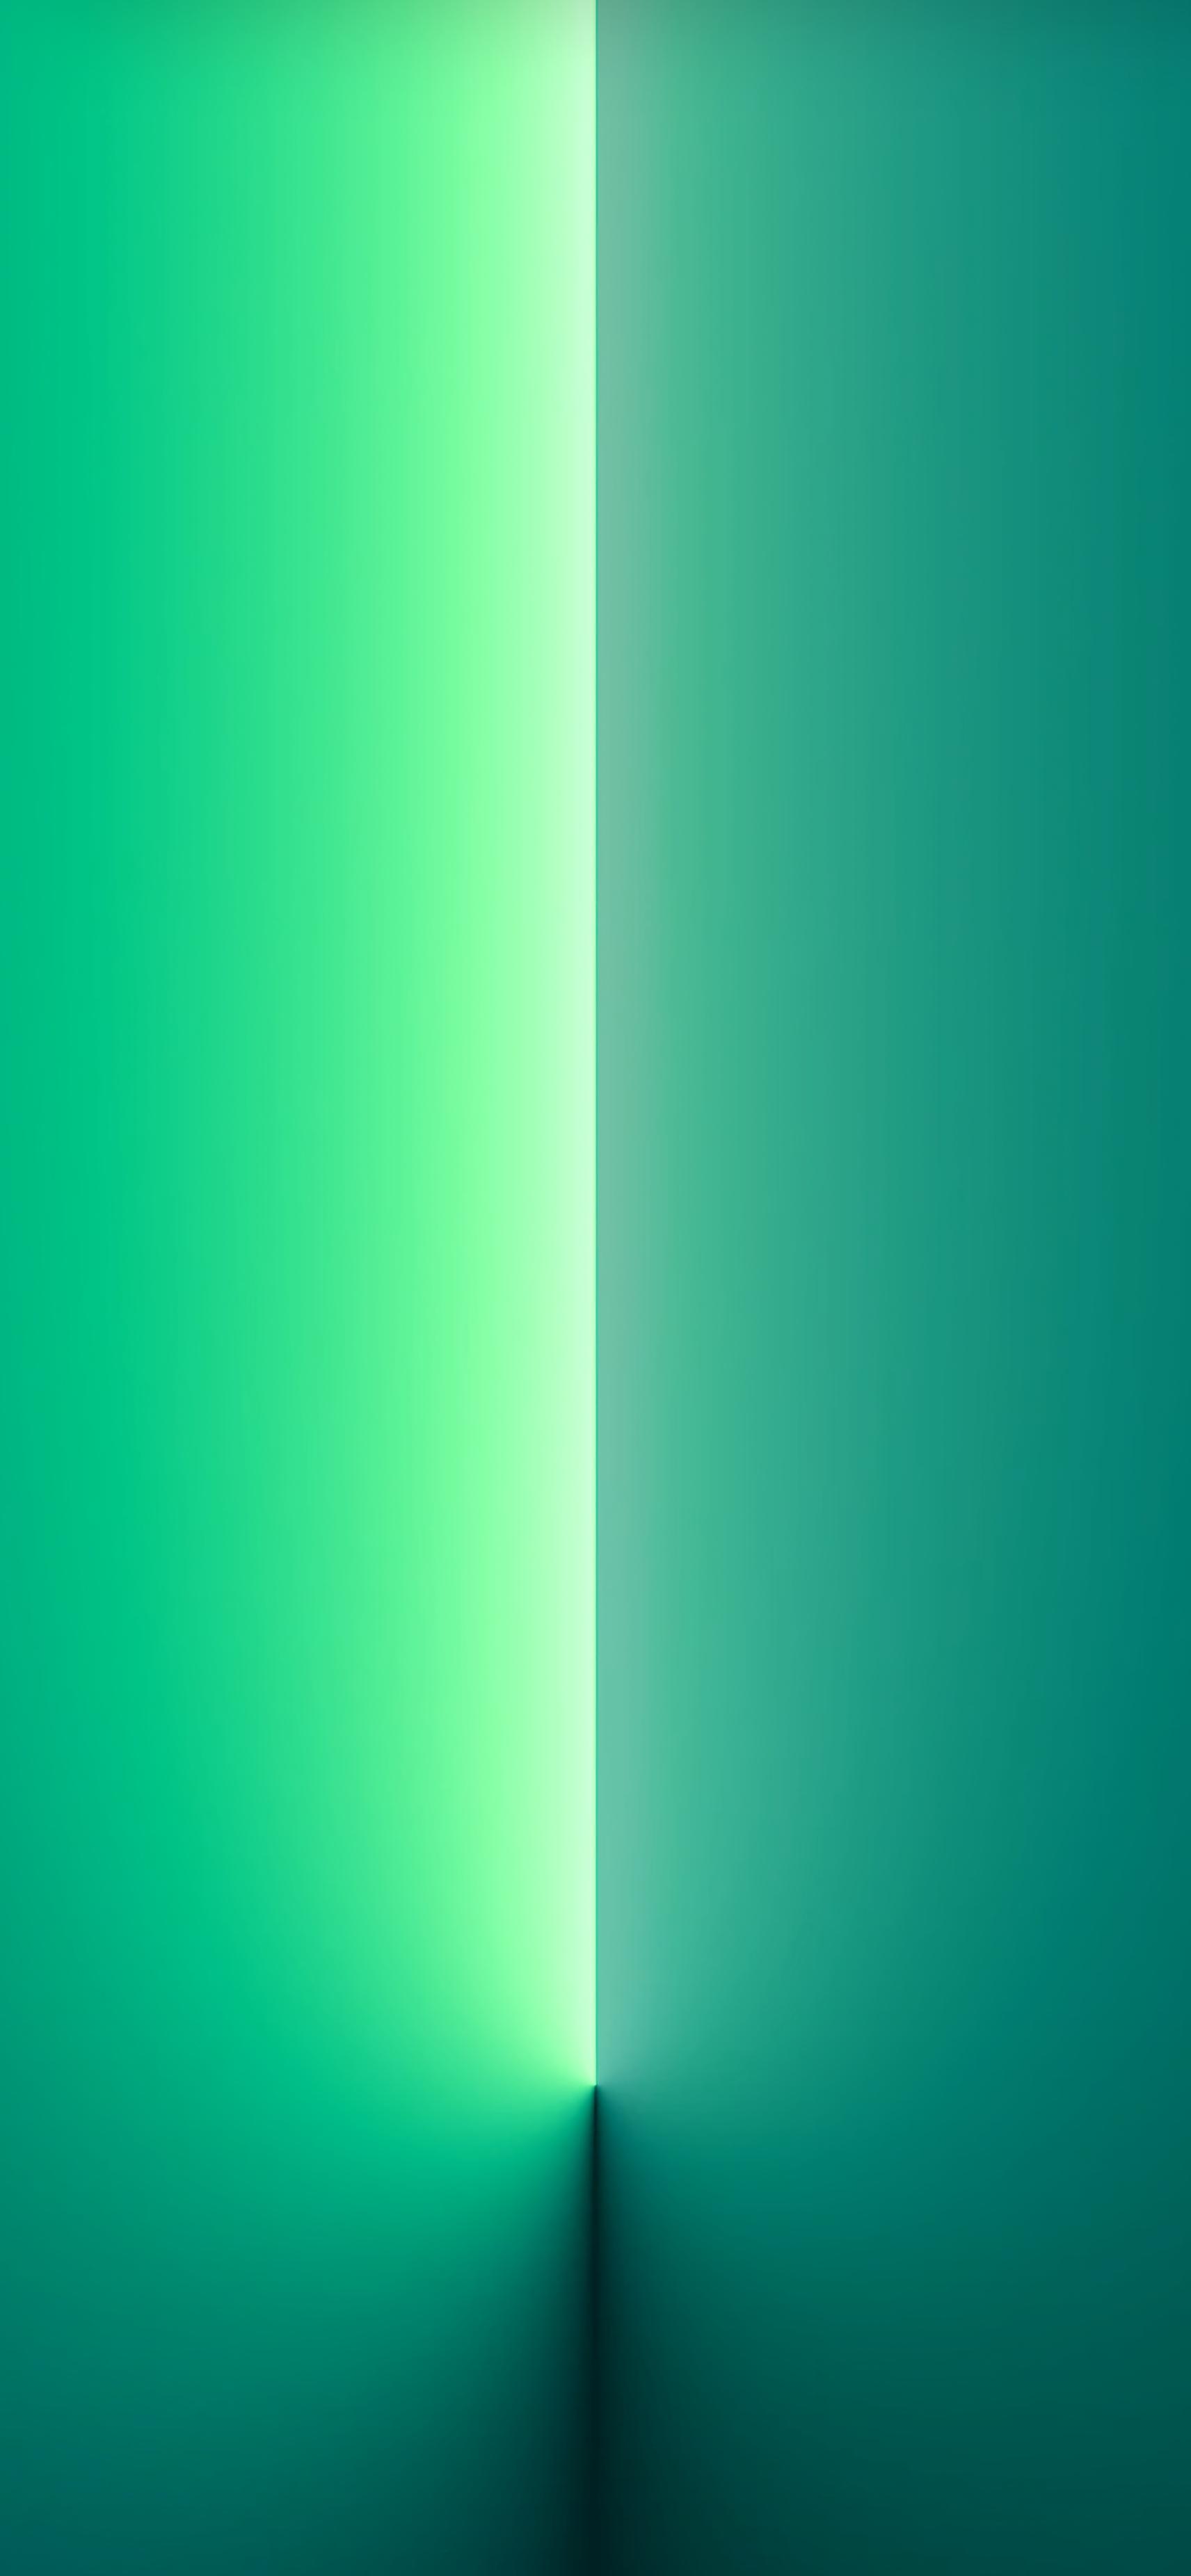 iPhone 13 pro inspired wallpaper birchtree idownloadblog sage green